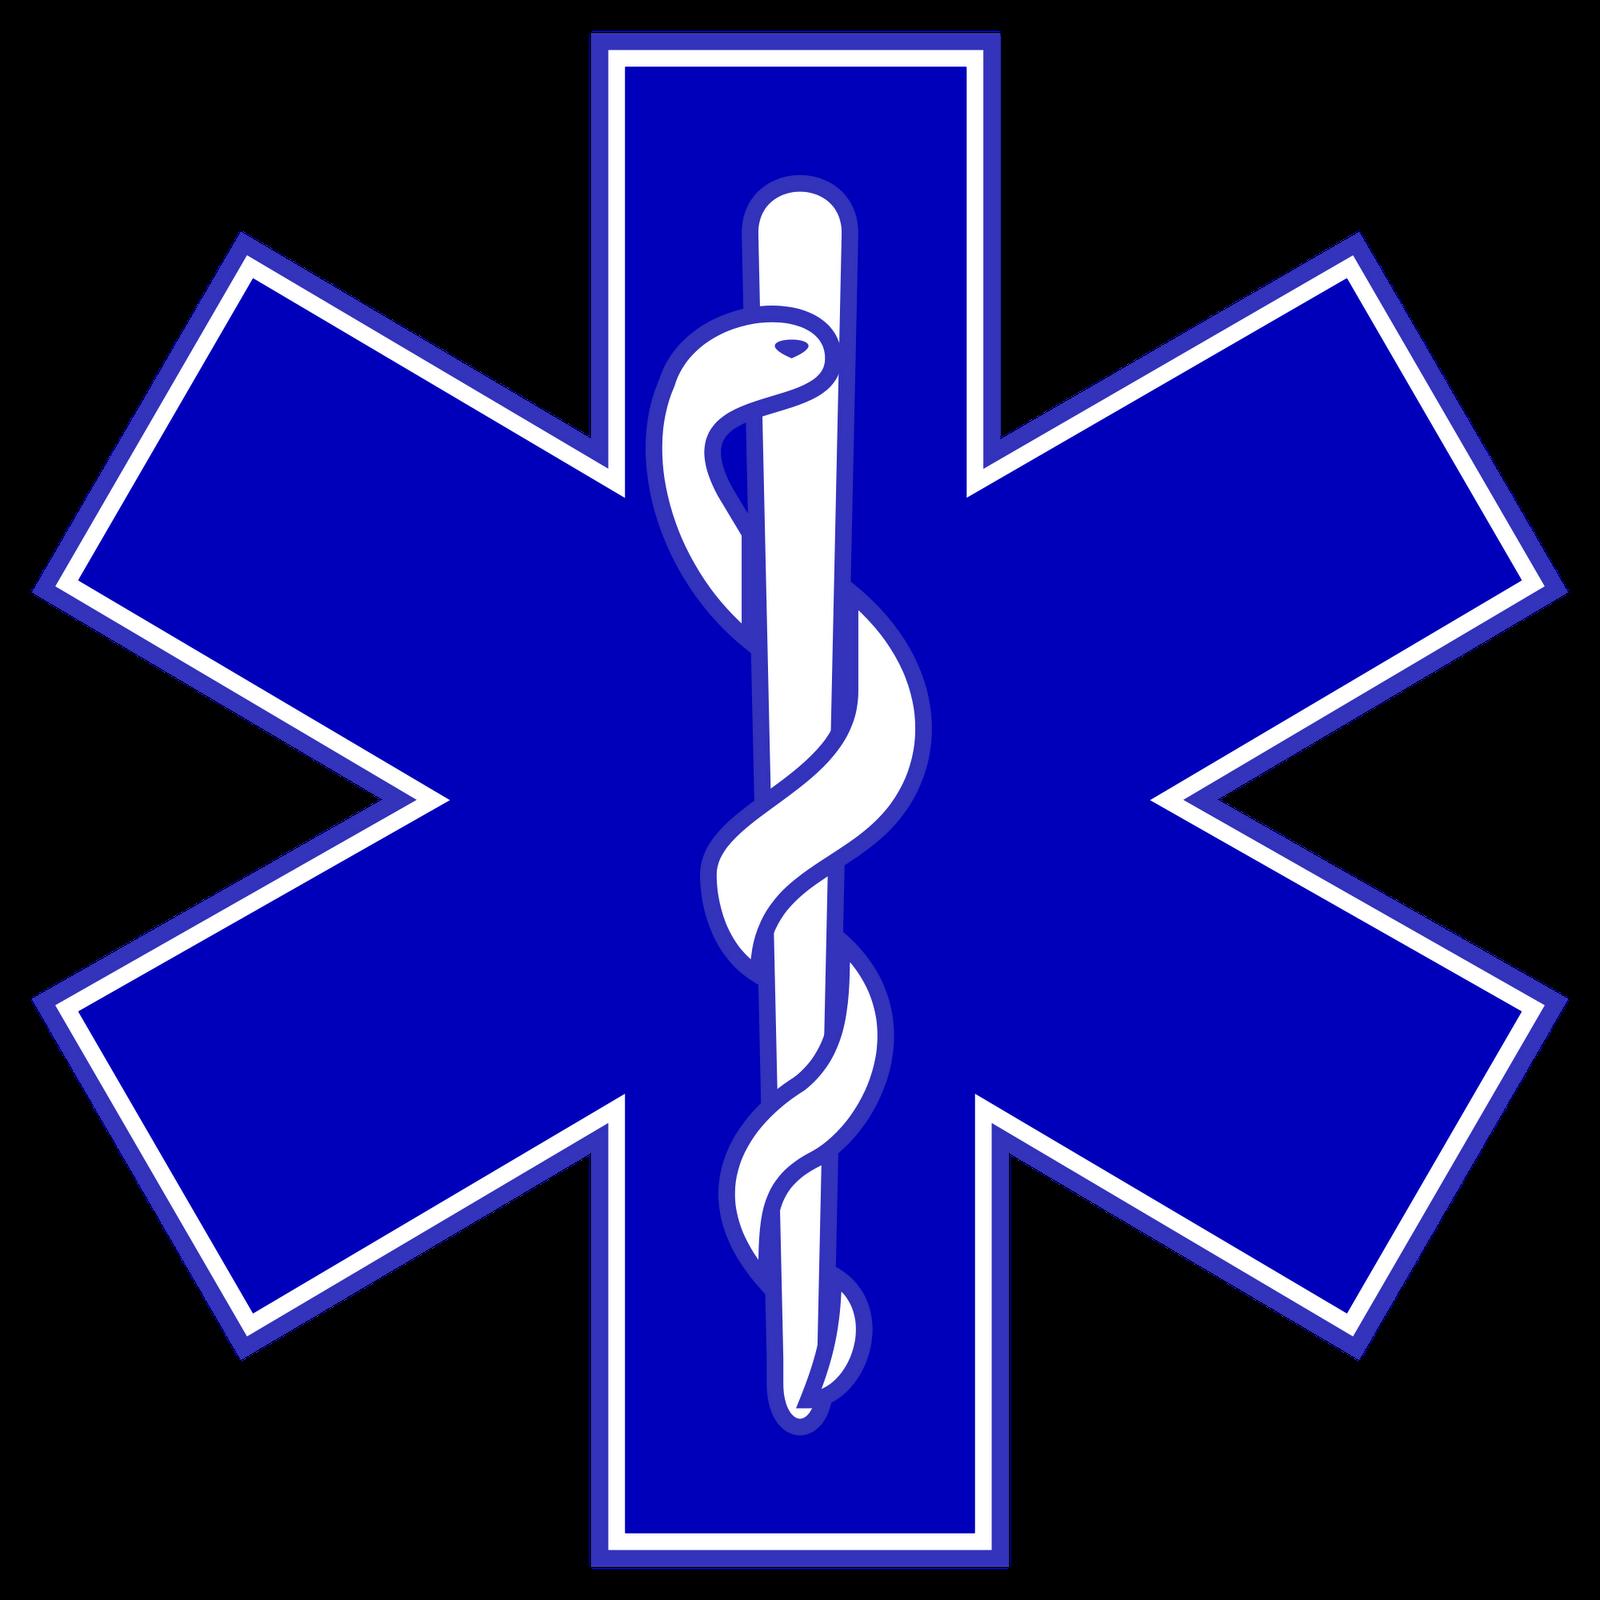 Medical Symbol Png - ClipArt Best